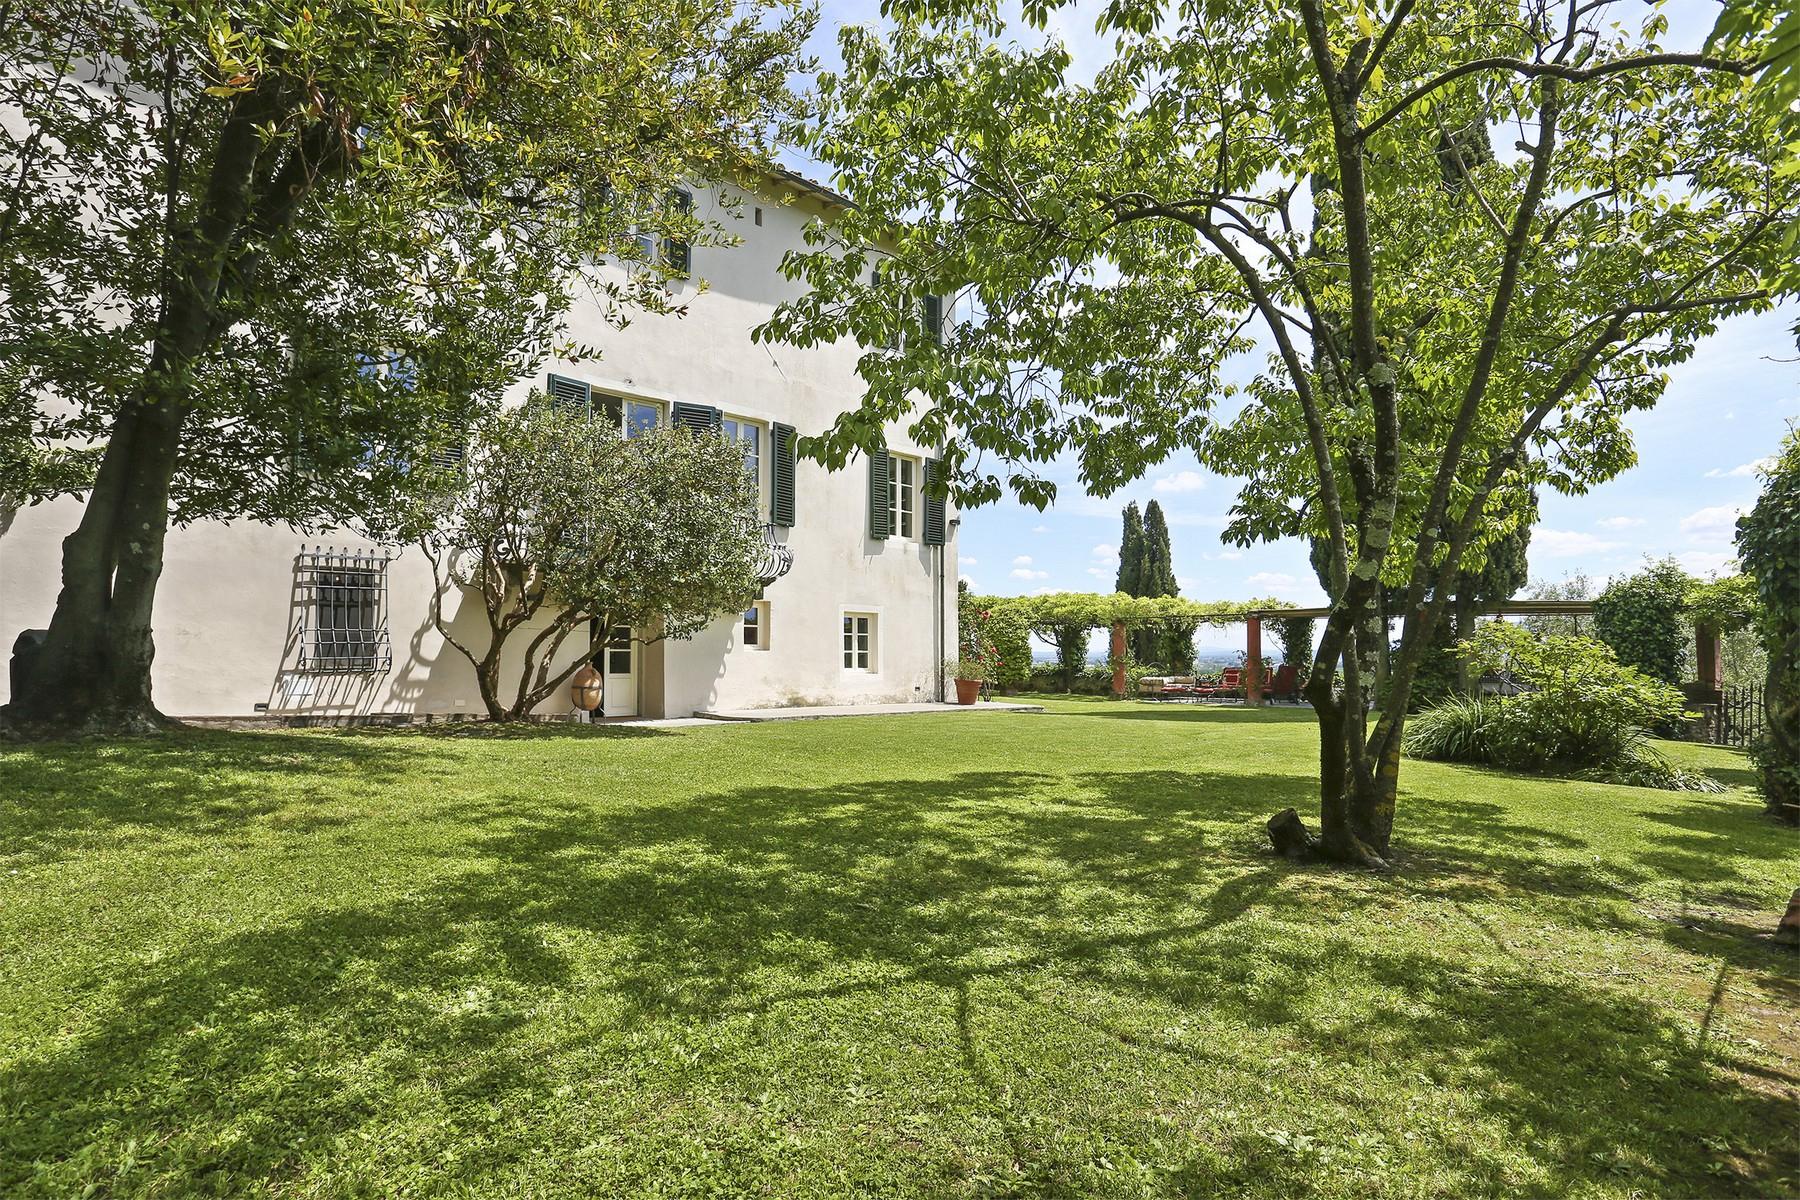 Villa in Vendita a Lucca: 5 locali, 735 mq - Foto 30